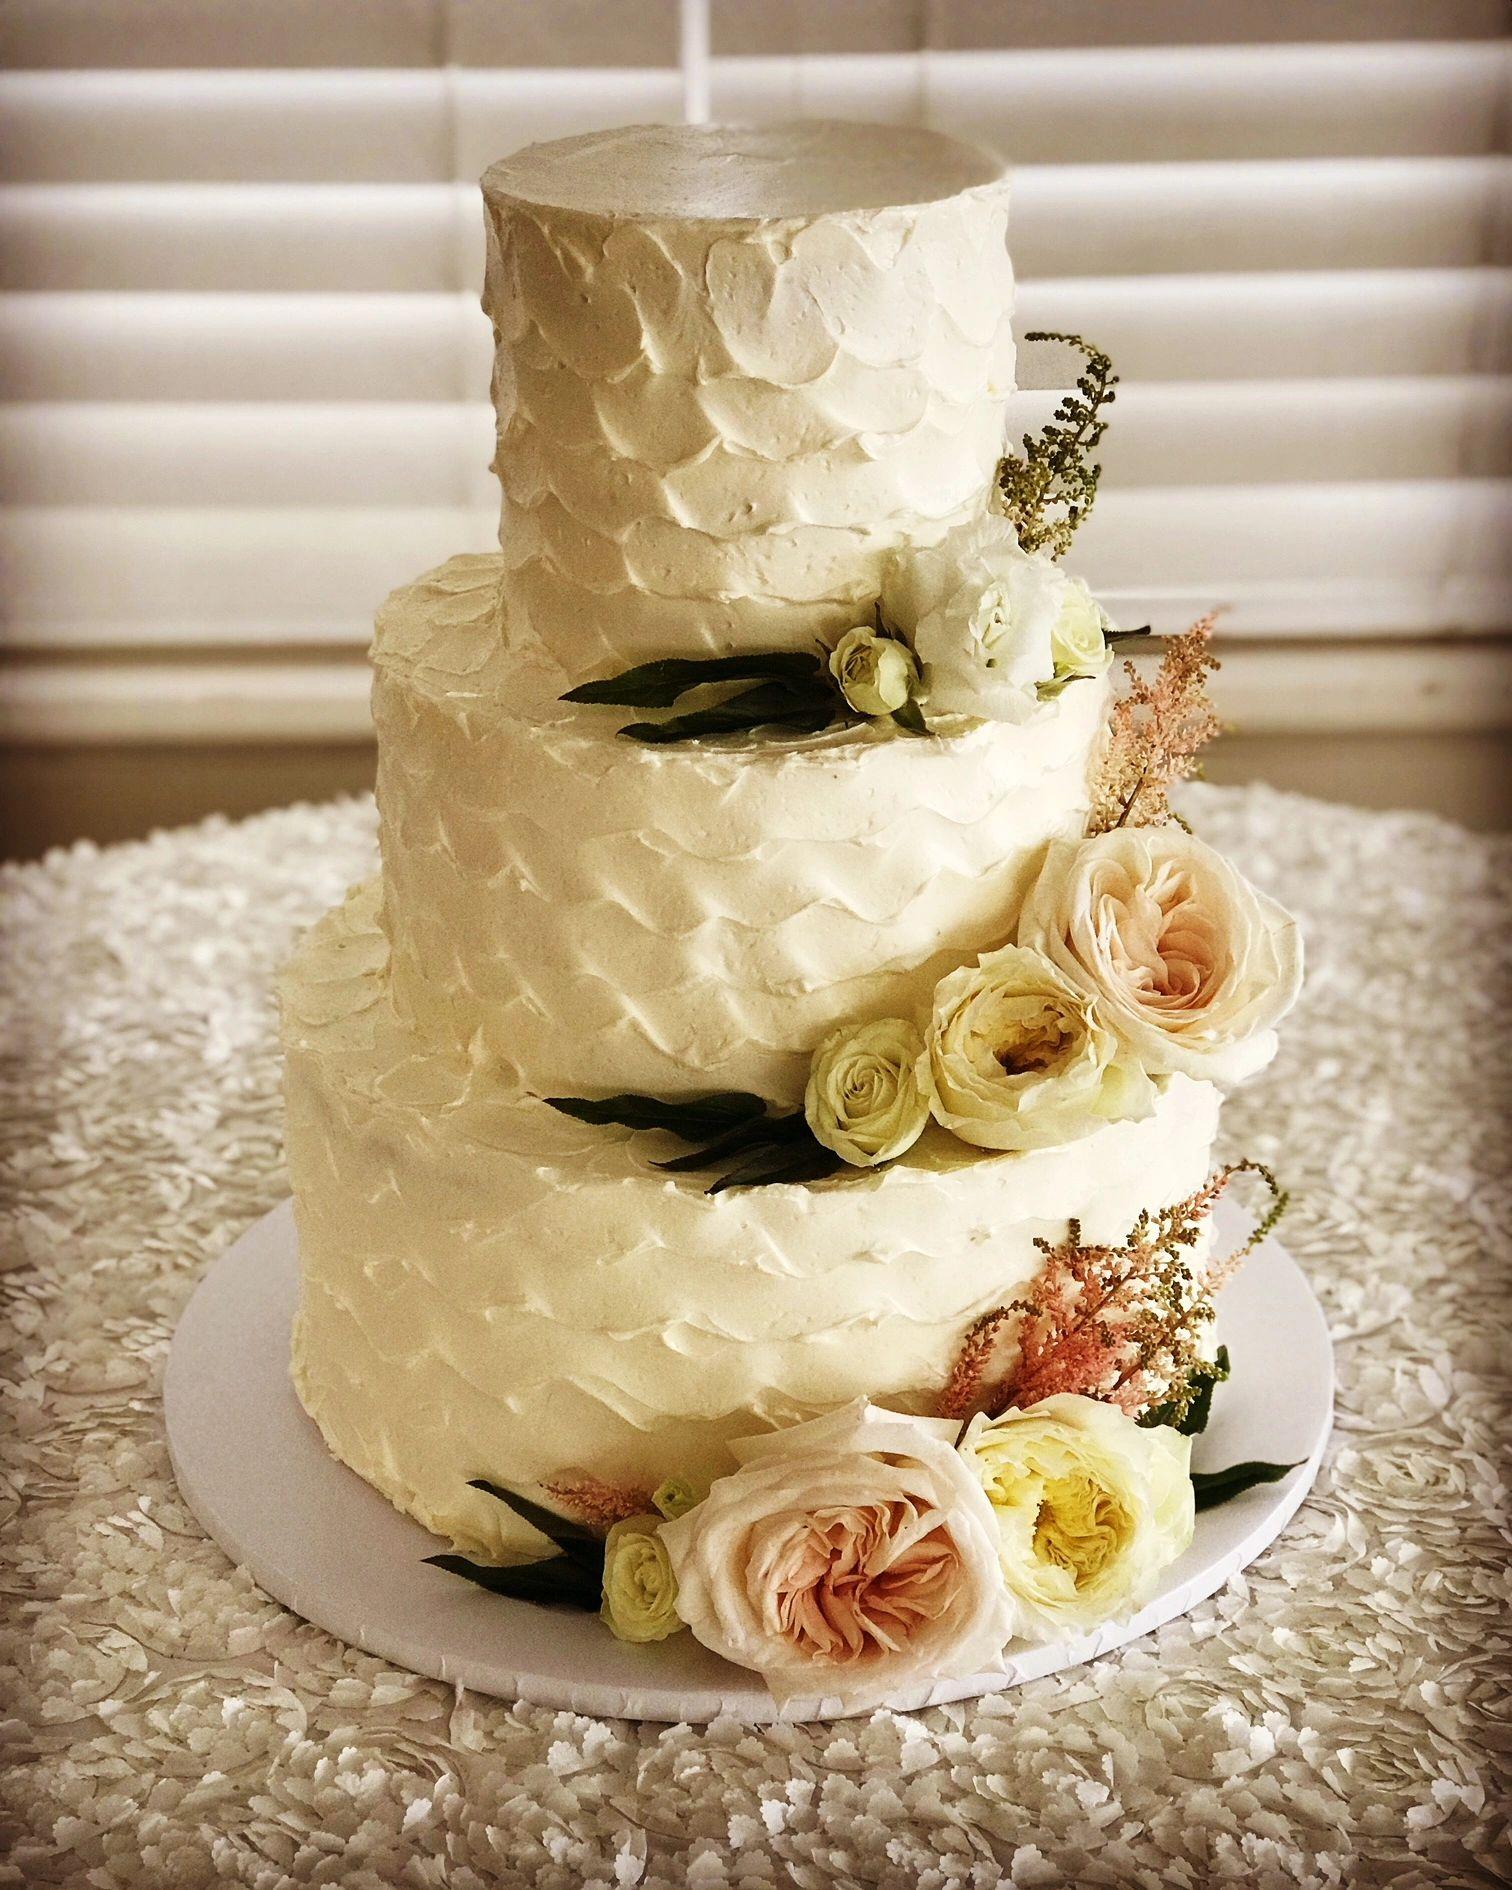 Custom Confections - Wedding Cakes, Desserts